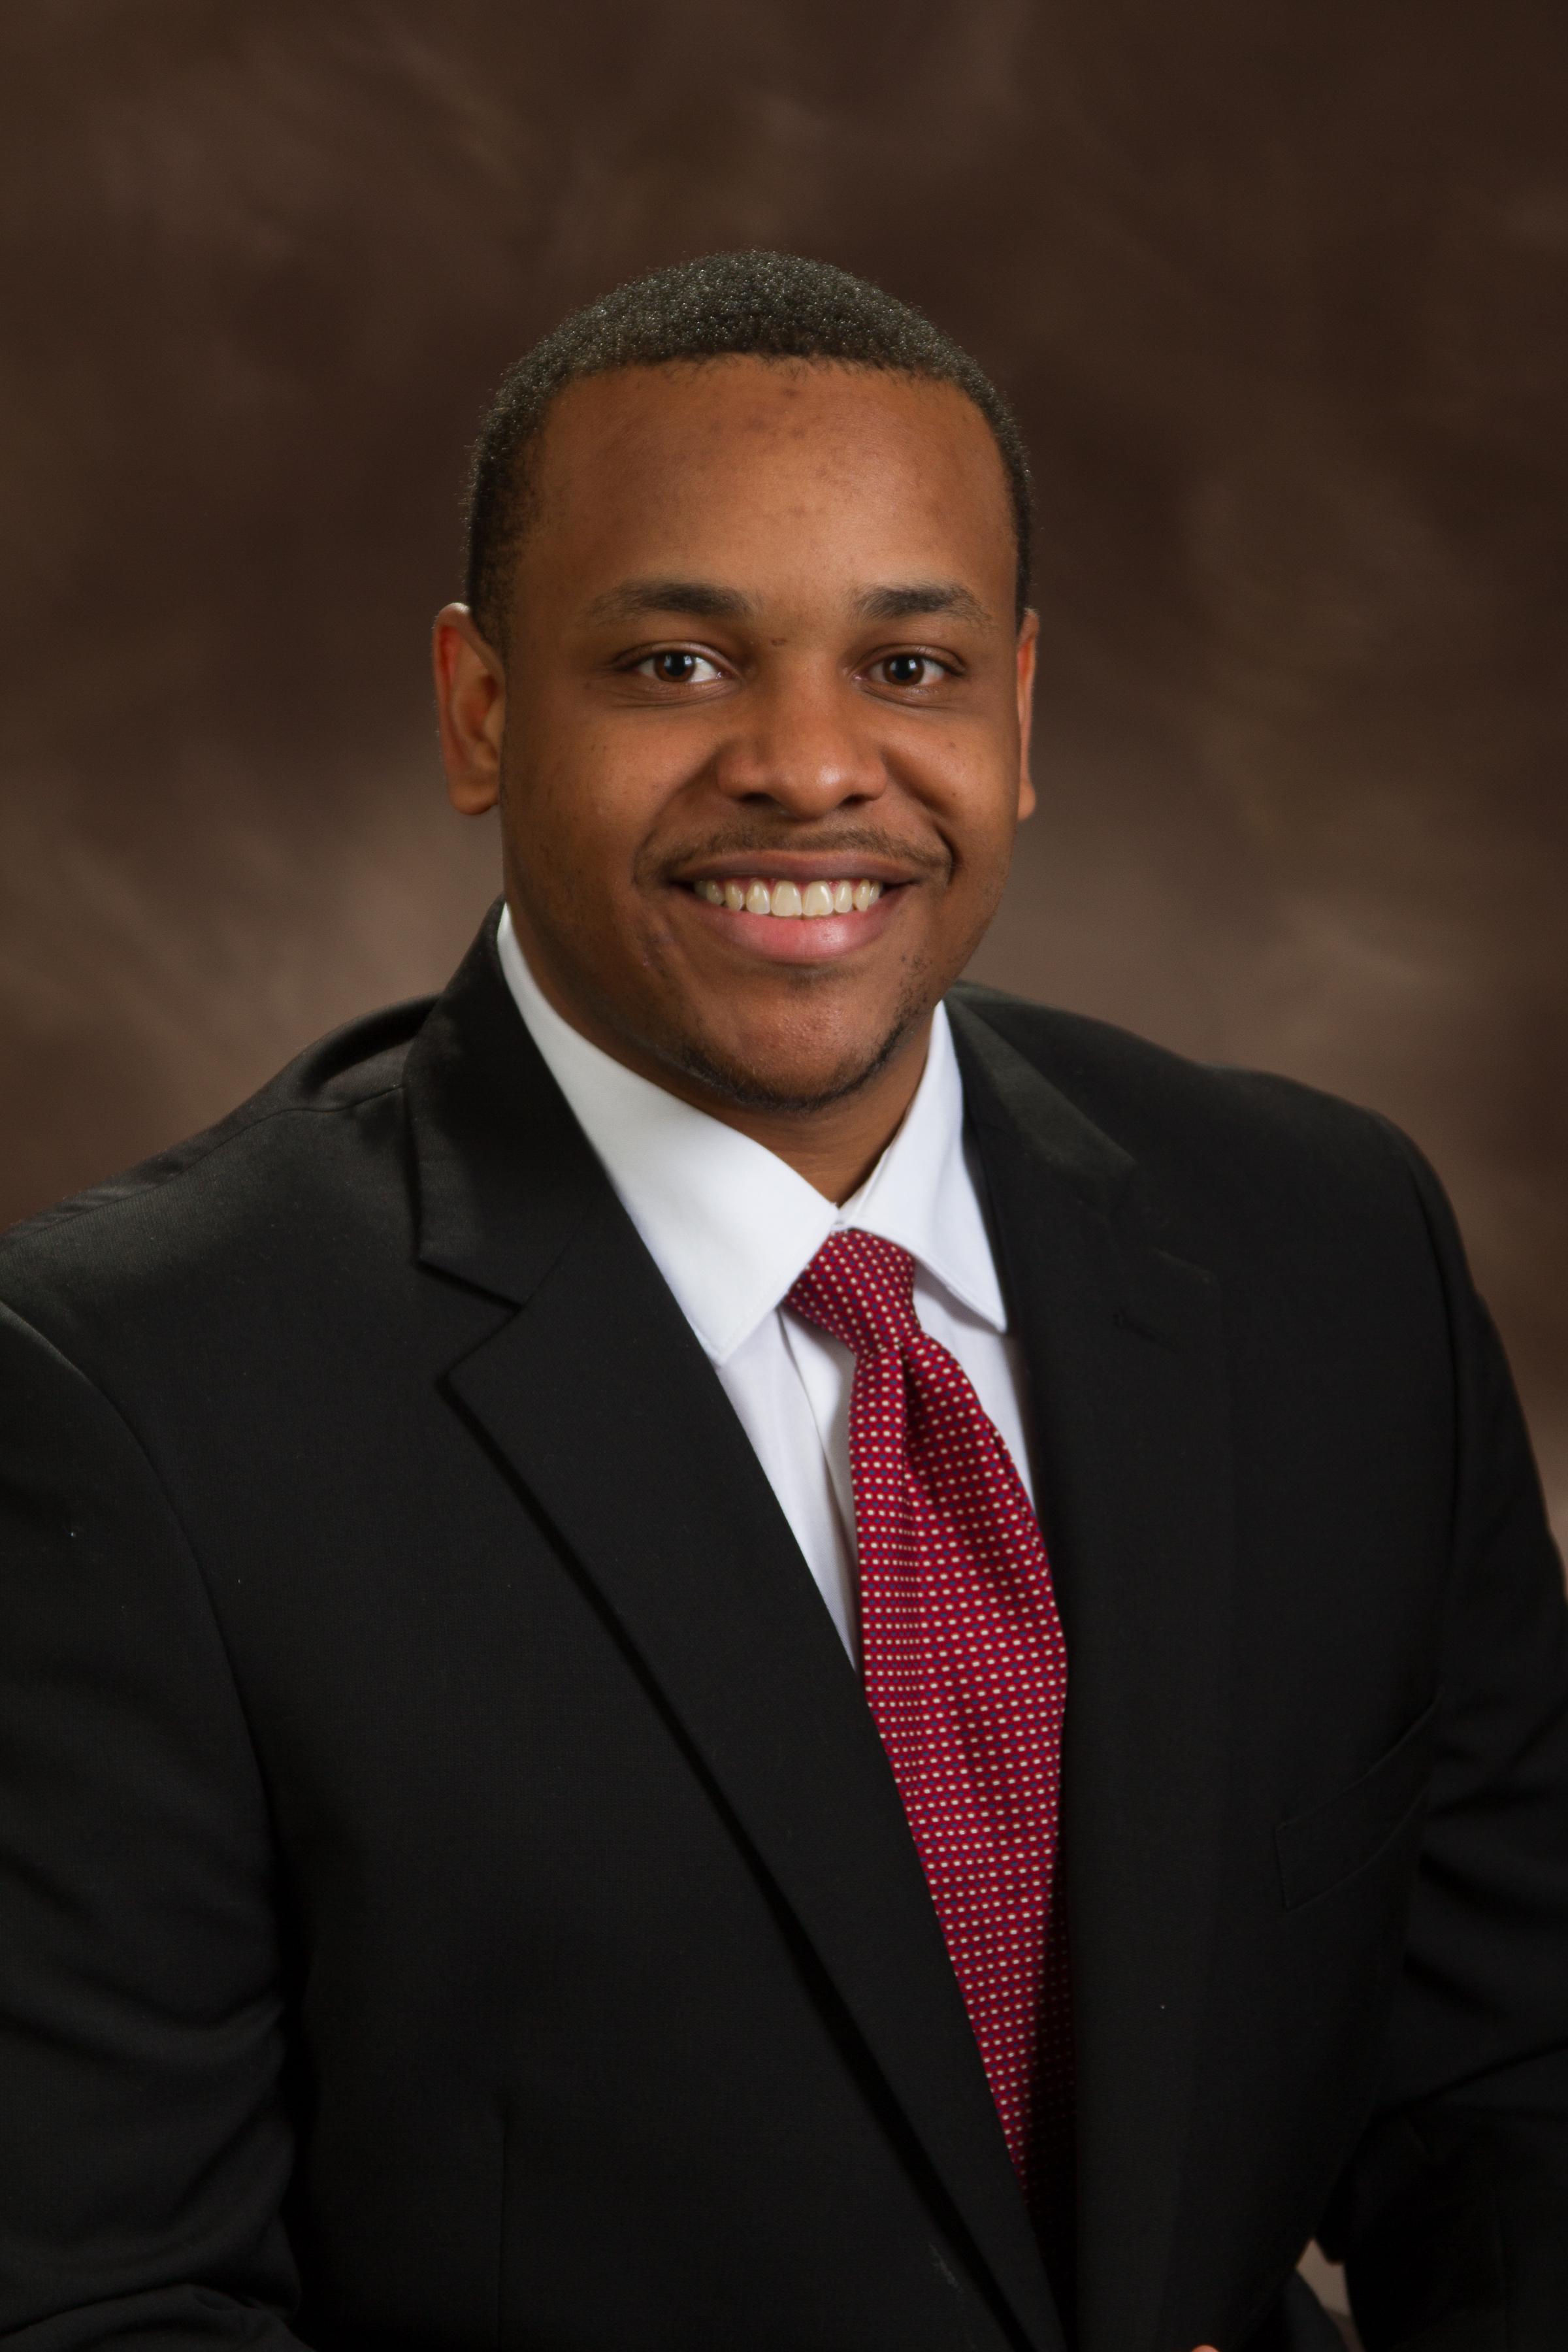 Nth Scholar Justin Hicks   Wake Forest University School of Medicine  Preceptor Dr. Macalus Hogan- University of Pittsburgh Medical Center  Pittsburgh, PA